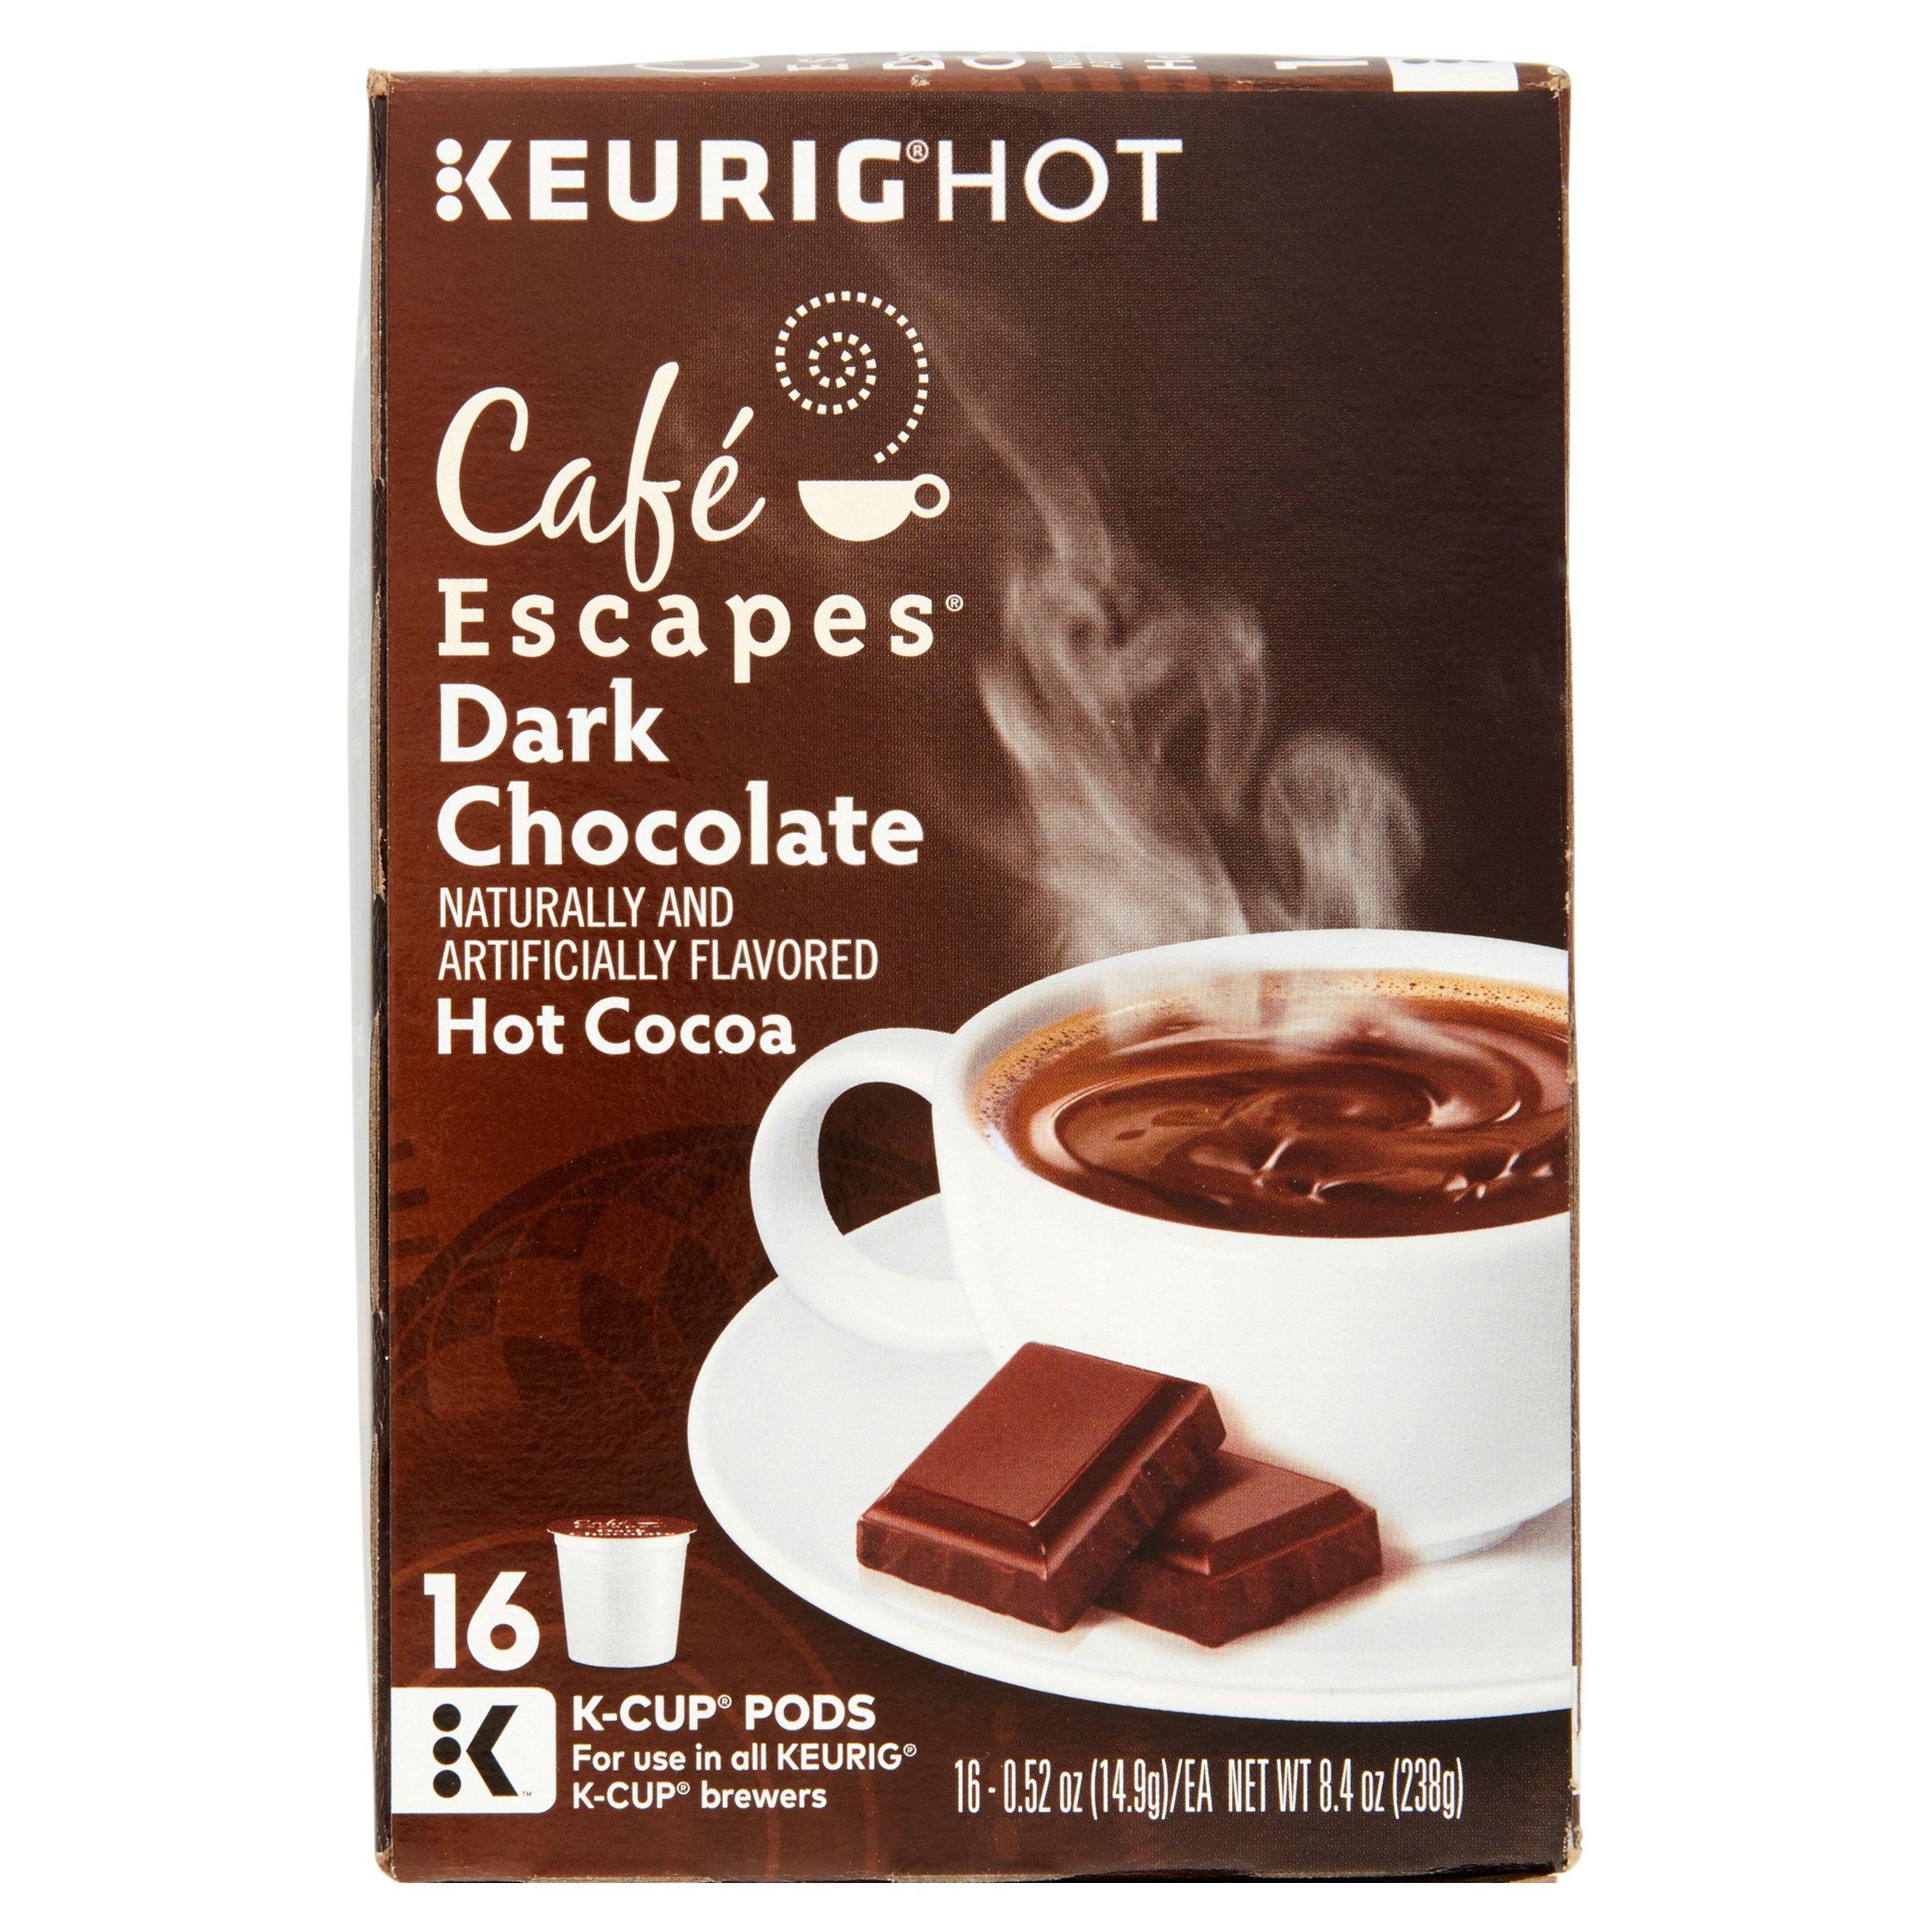 Keurig Hot Café Escapes Hot Cocoa Dark Chocolate K-Cup Pods, 0.52 ...